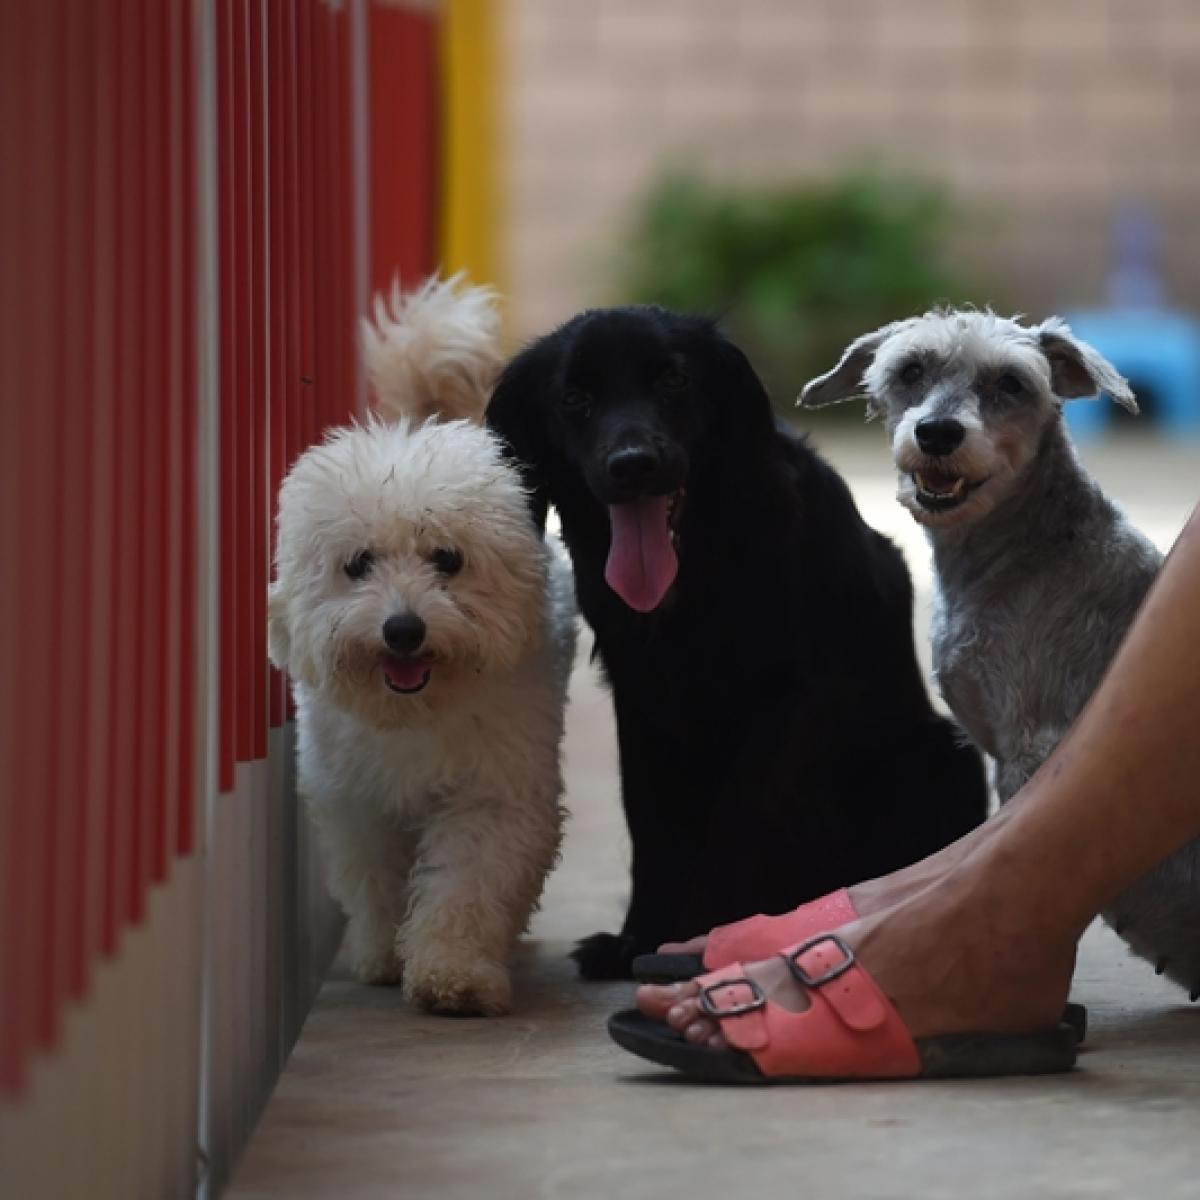 Don't abandon pets, owners told writes Nozia Sayyad